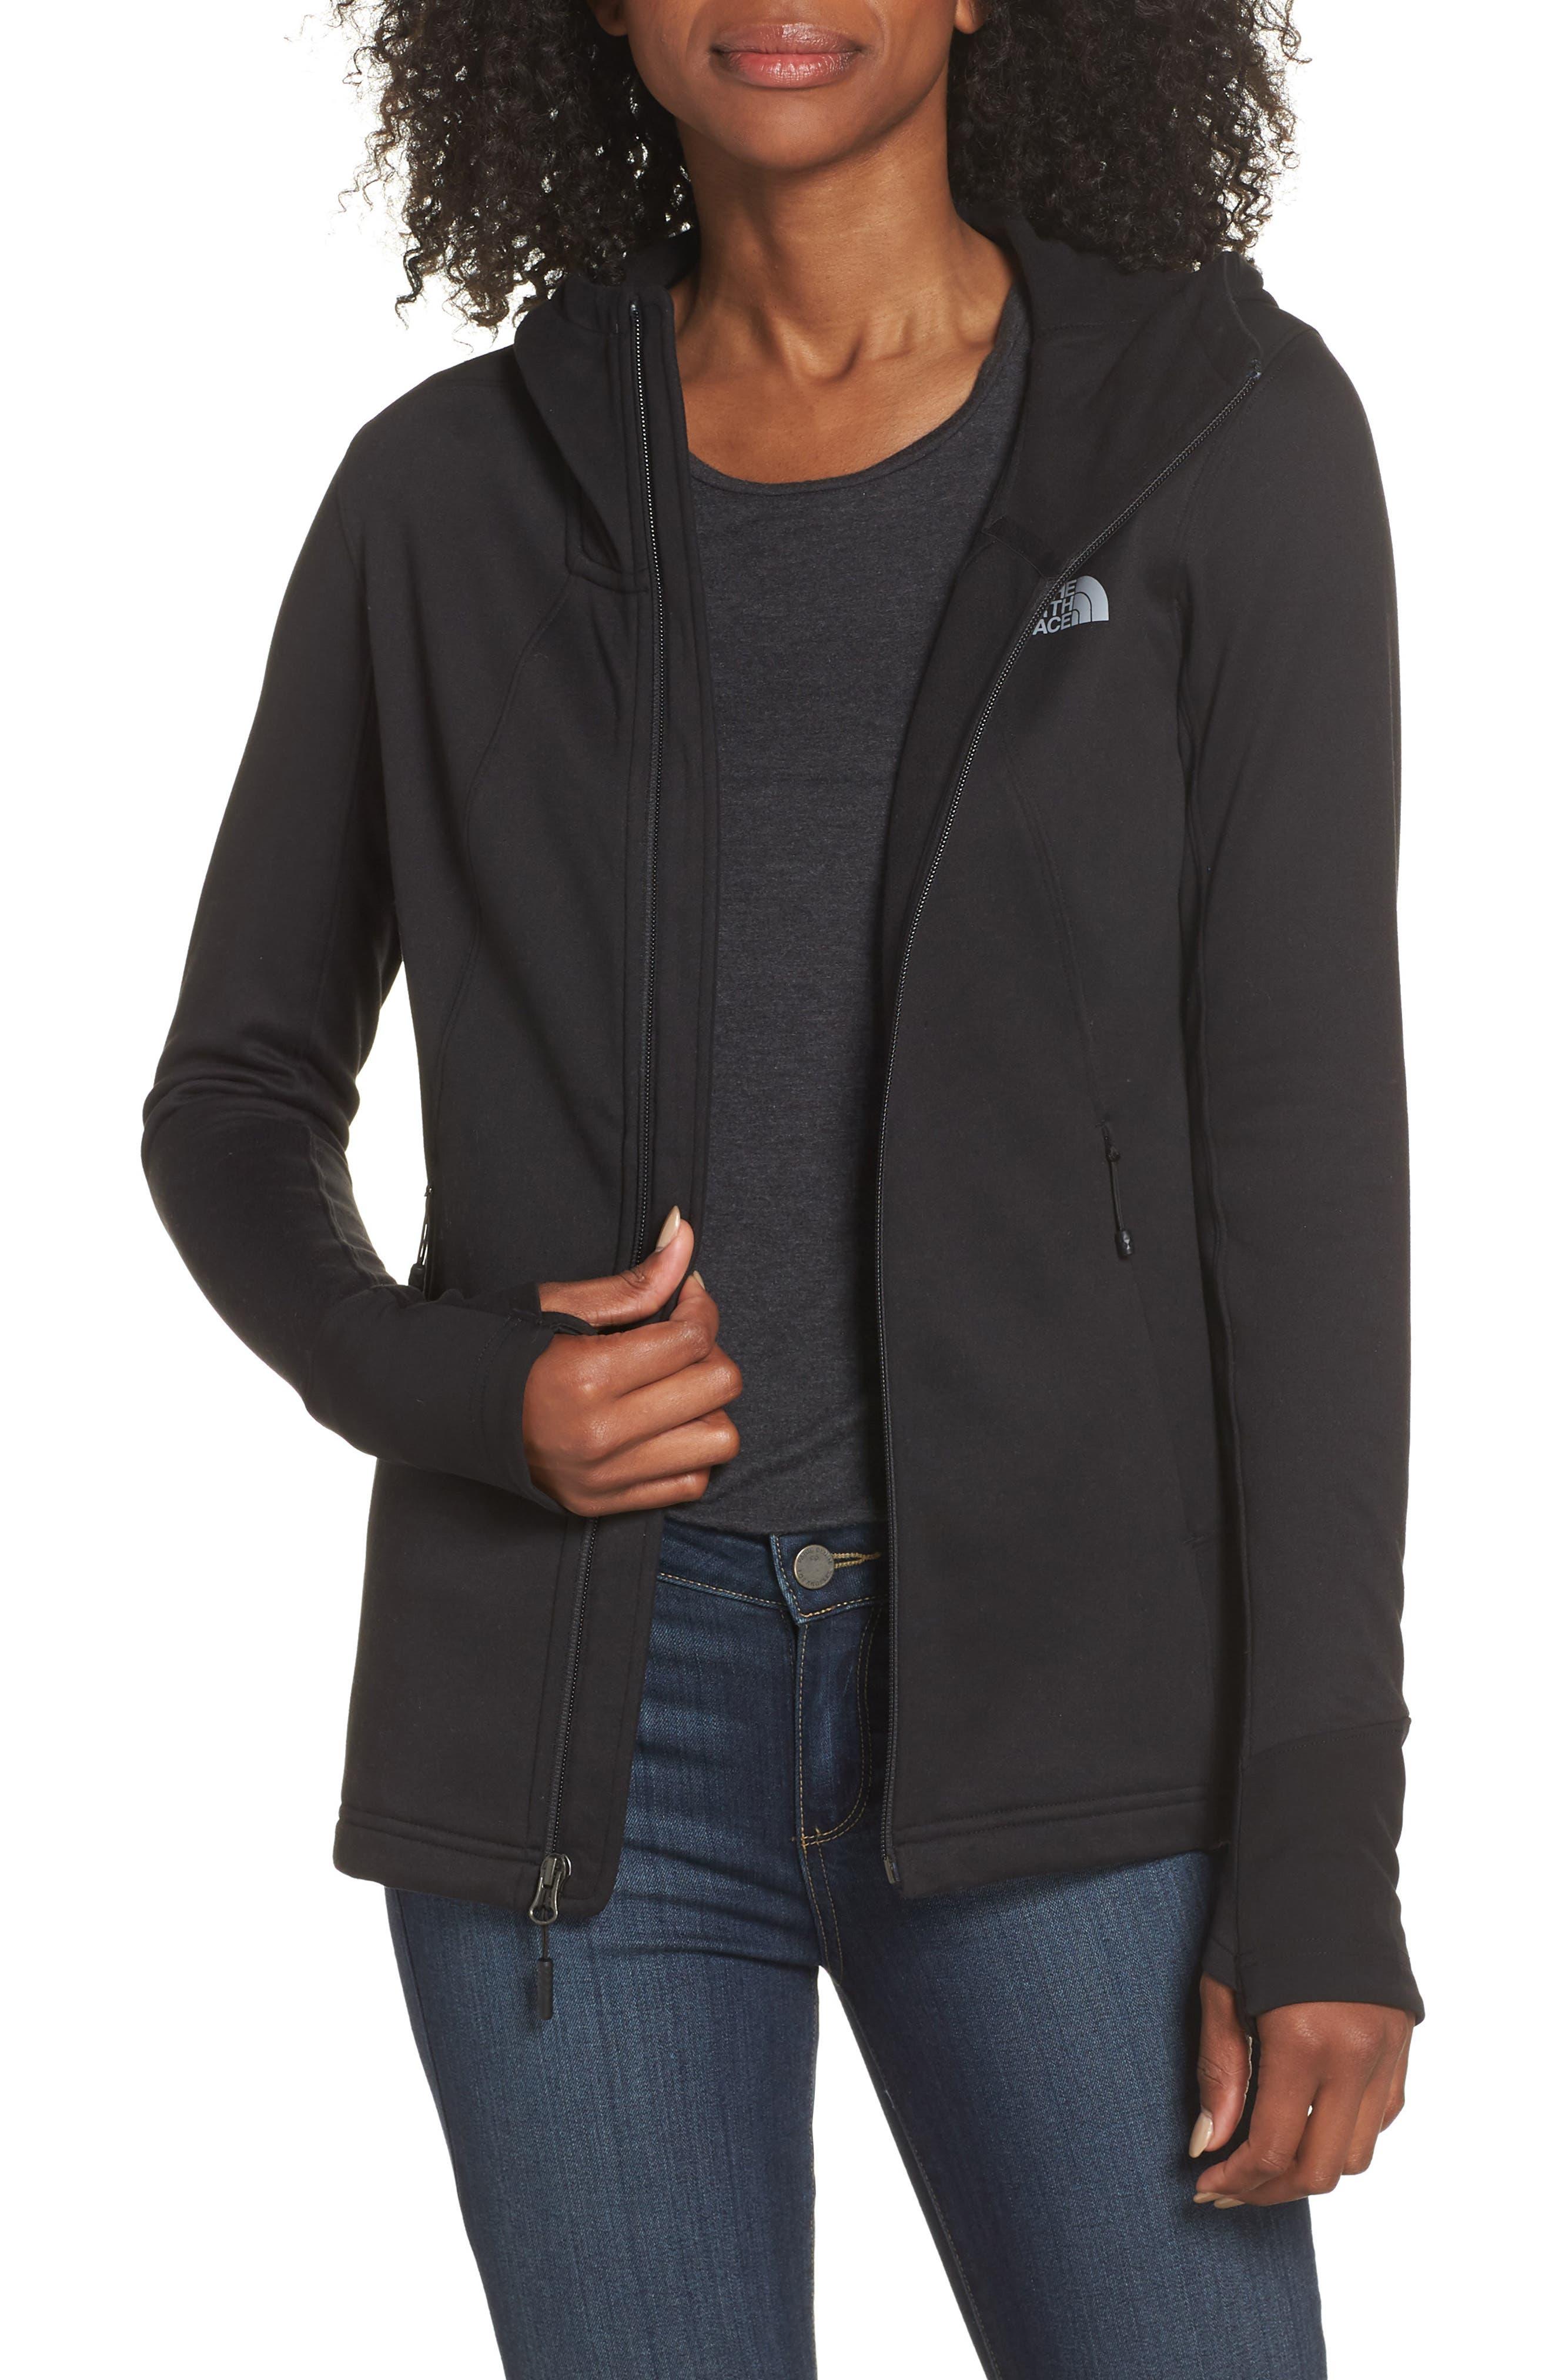 The North Face Shastina Stretch Zip Jacket